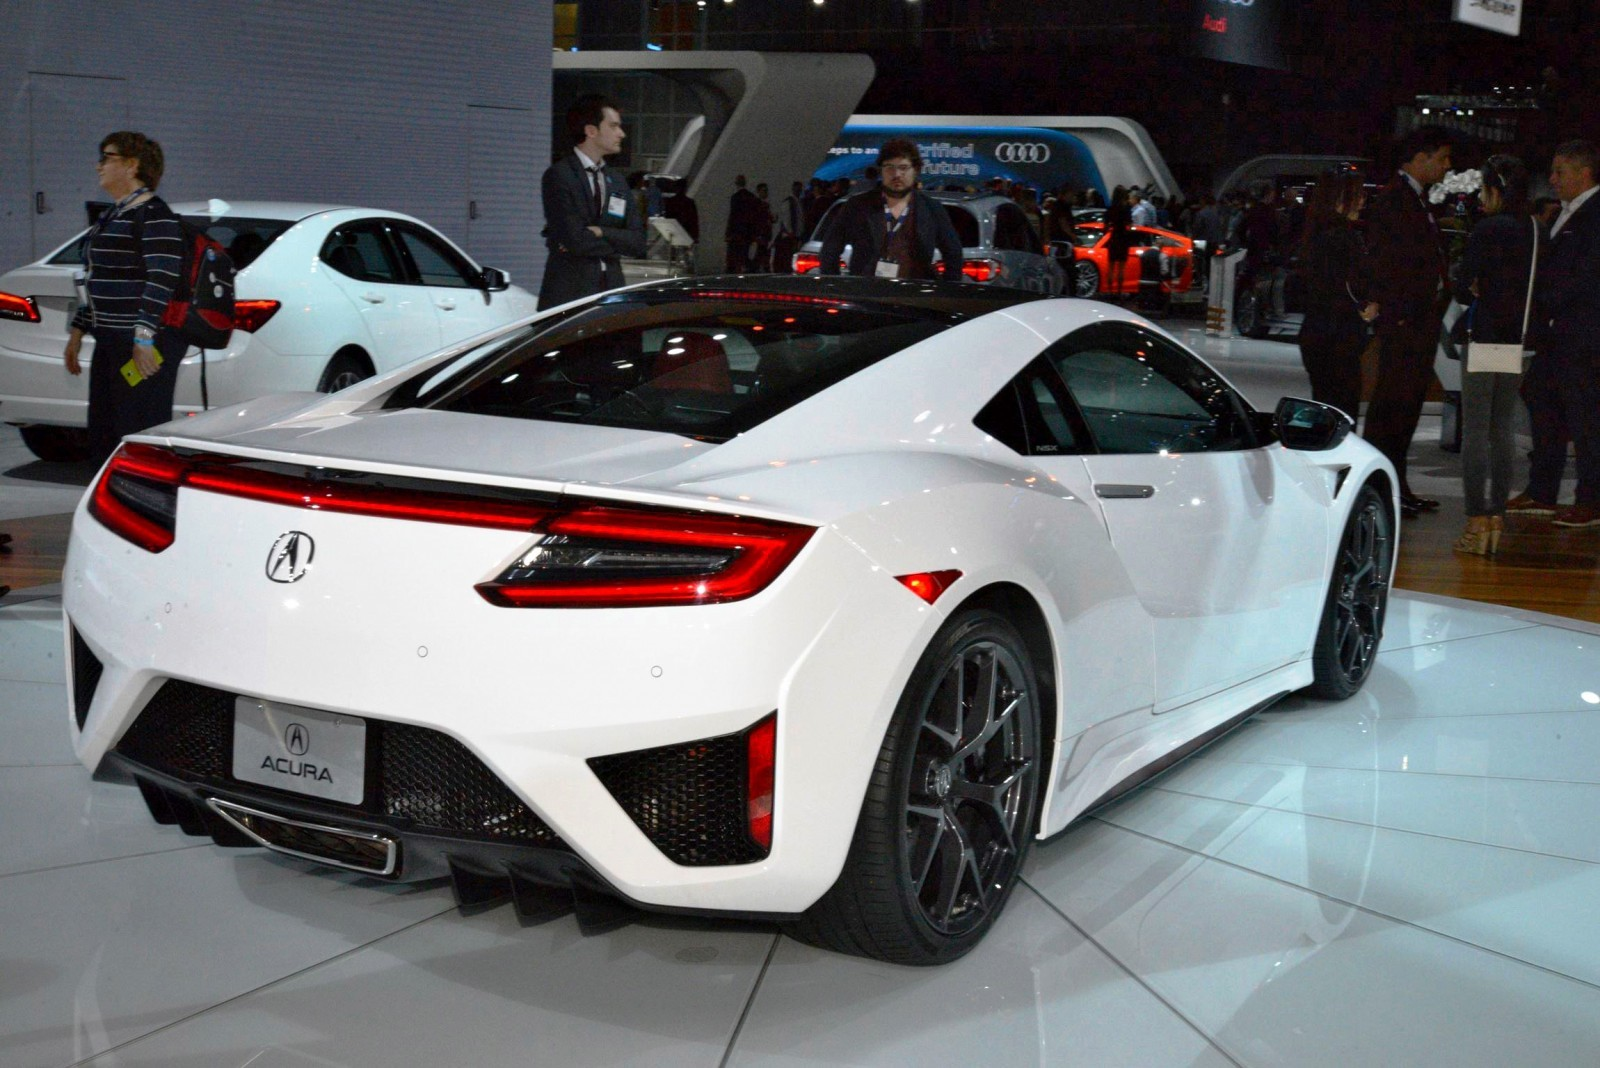 2017 Acura NSX white 2